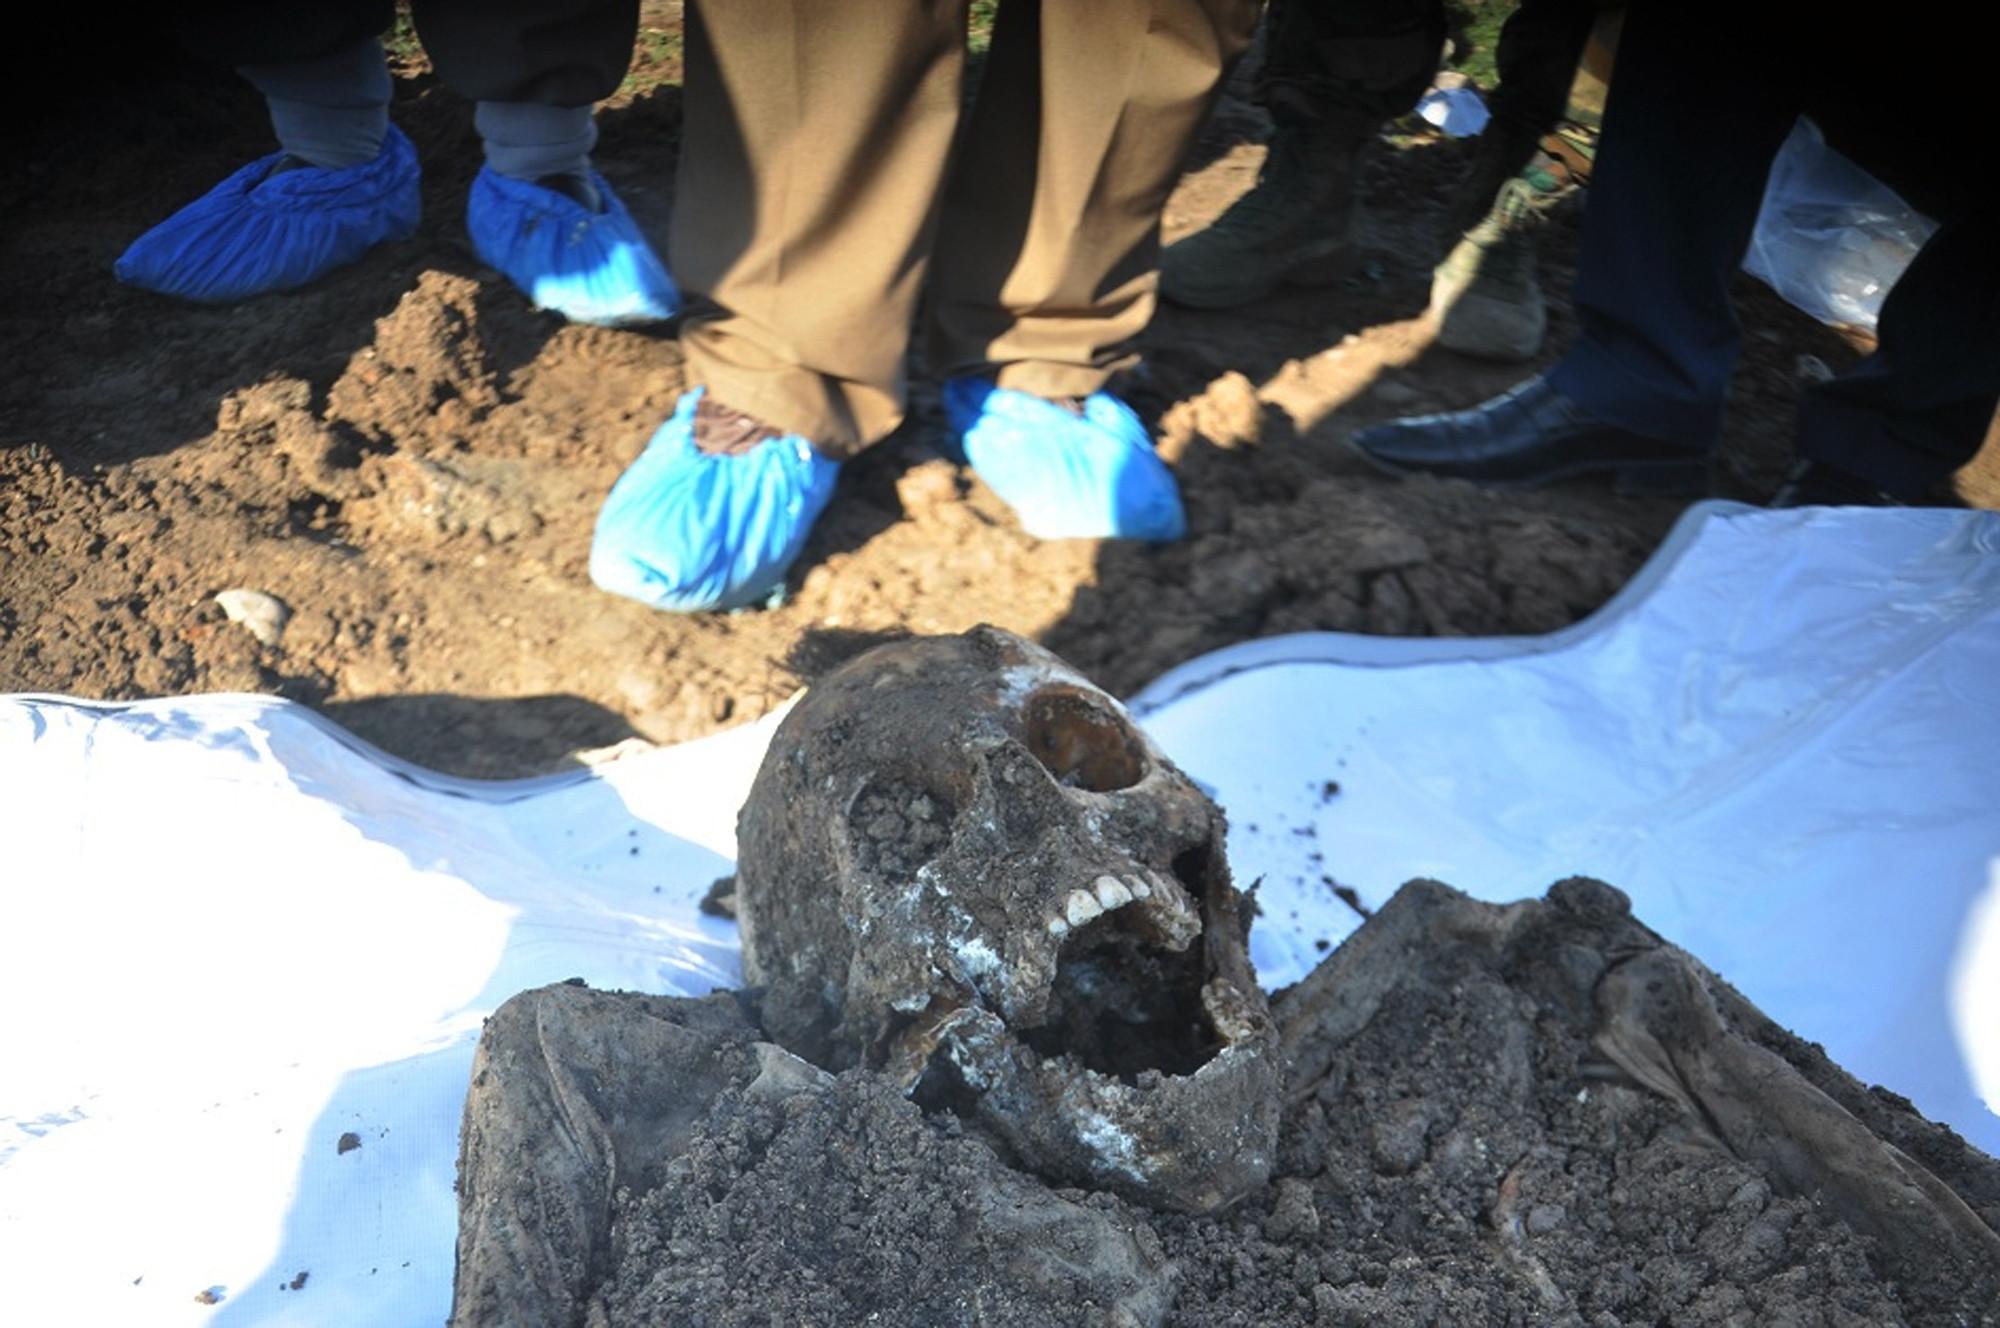 Ct-islamic-state-mass-graves-20160830